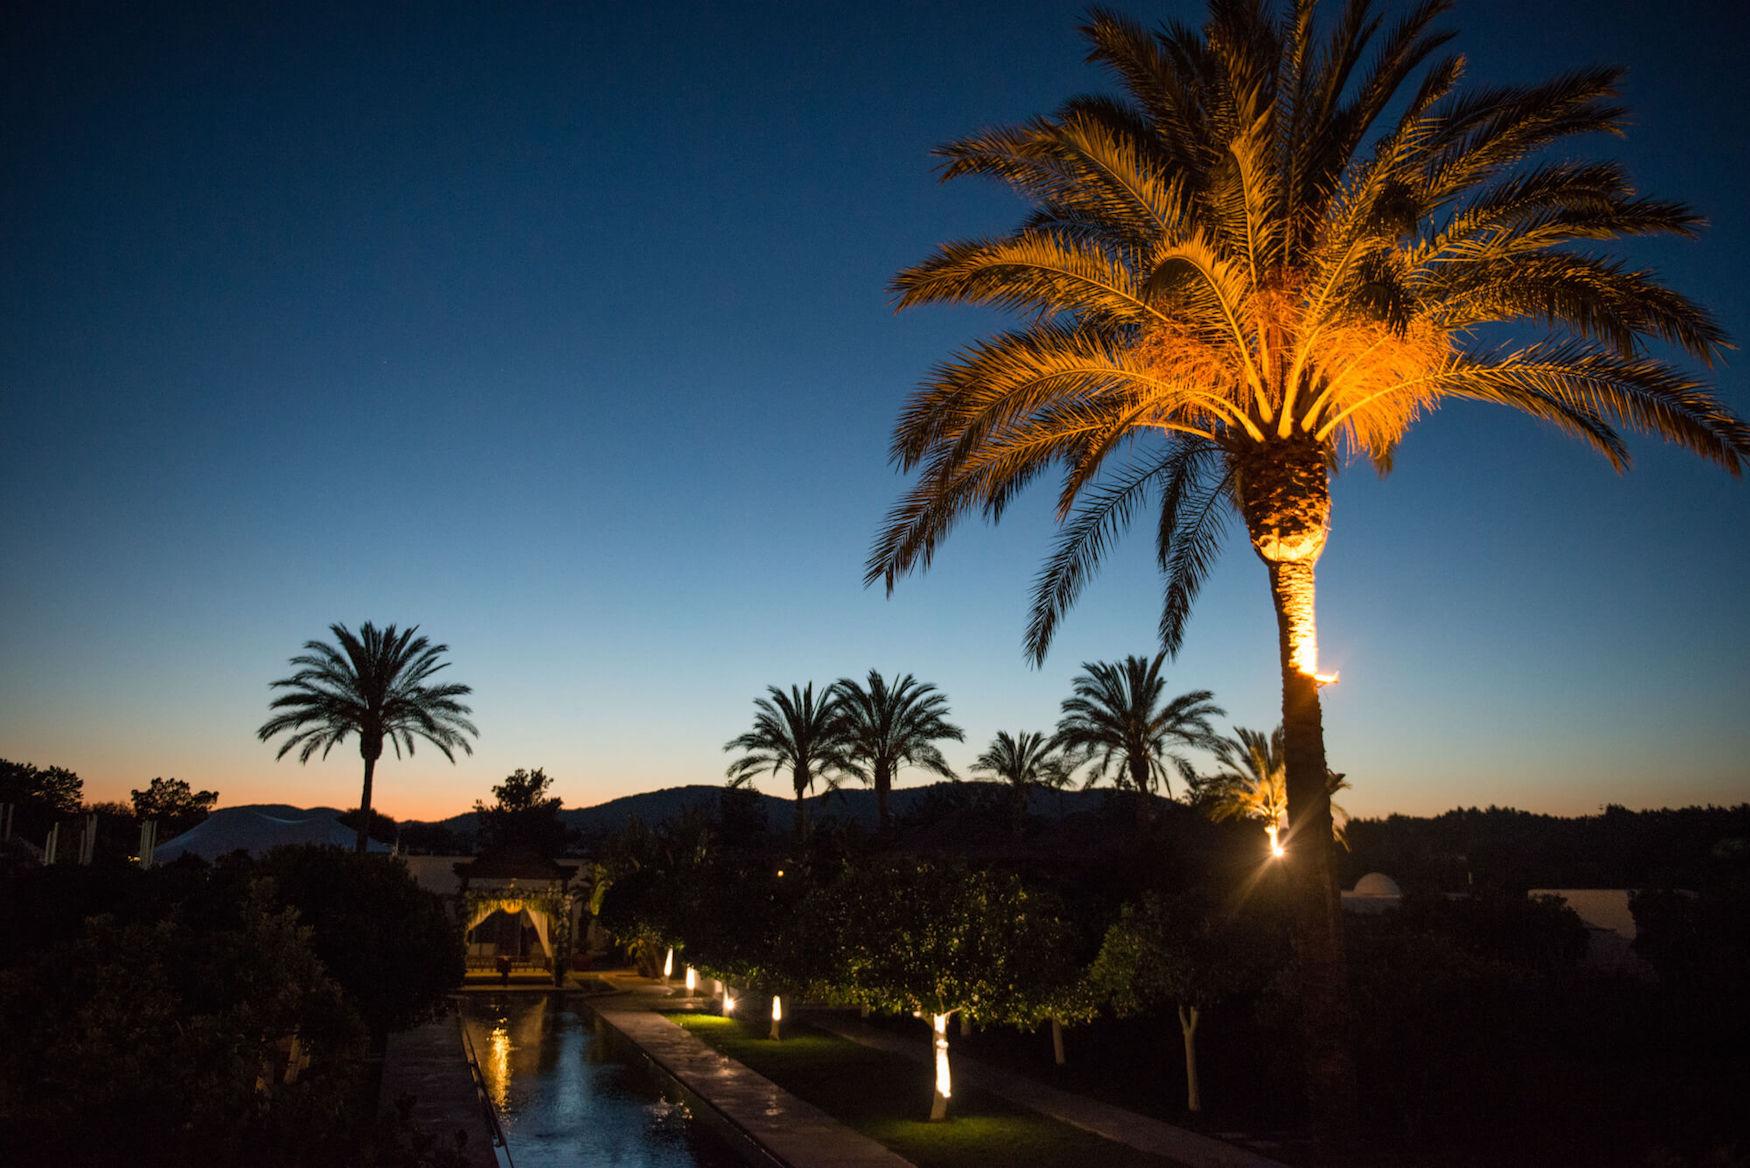 night sky dusk poolside palm trees